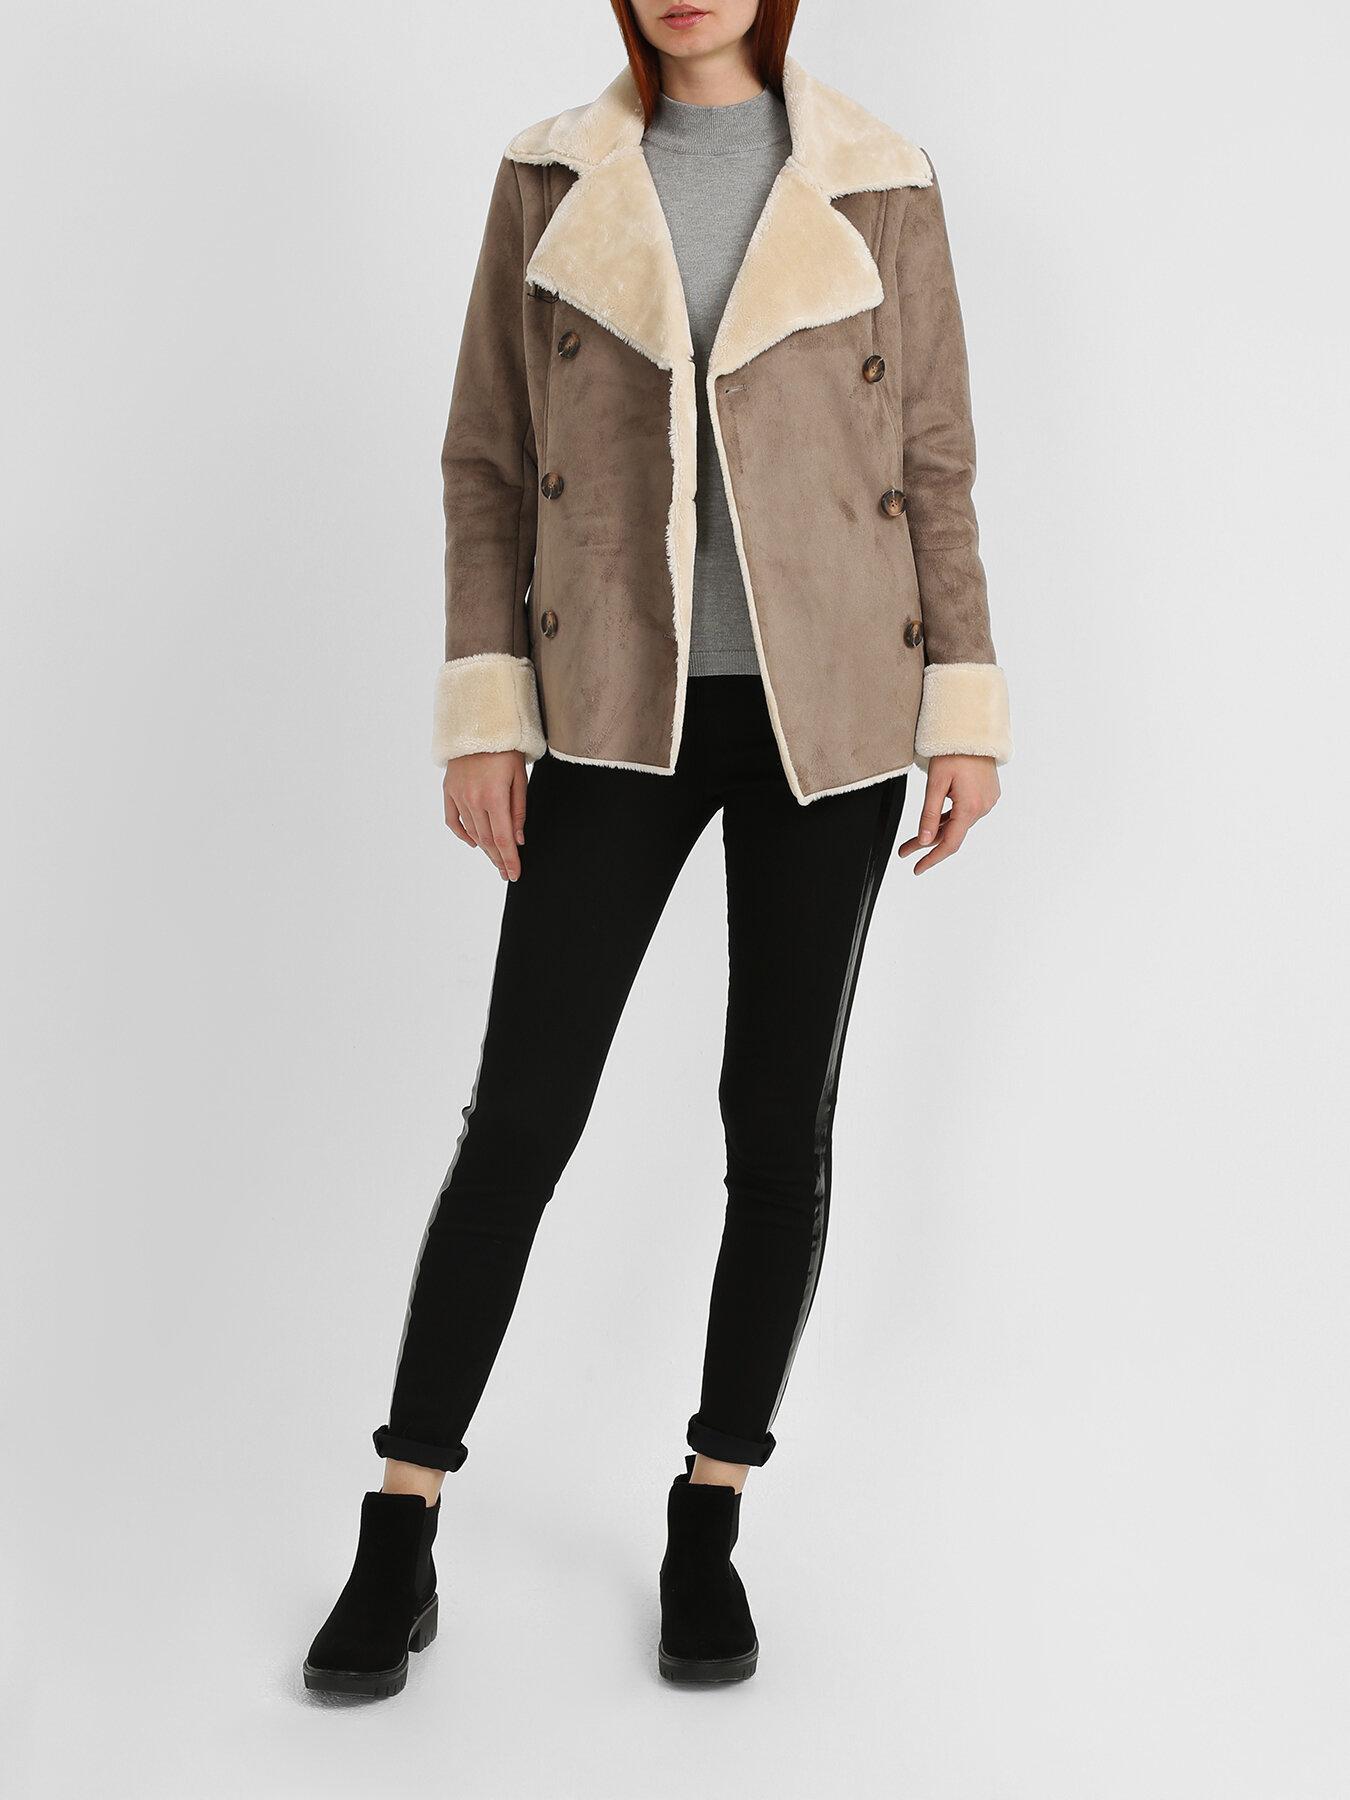 Куртка 6 P.M. Женская дубленка